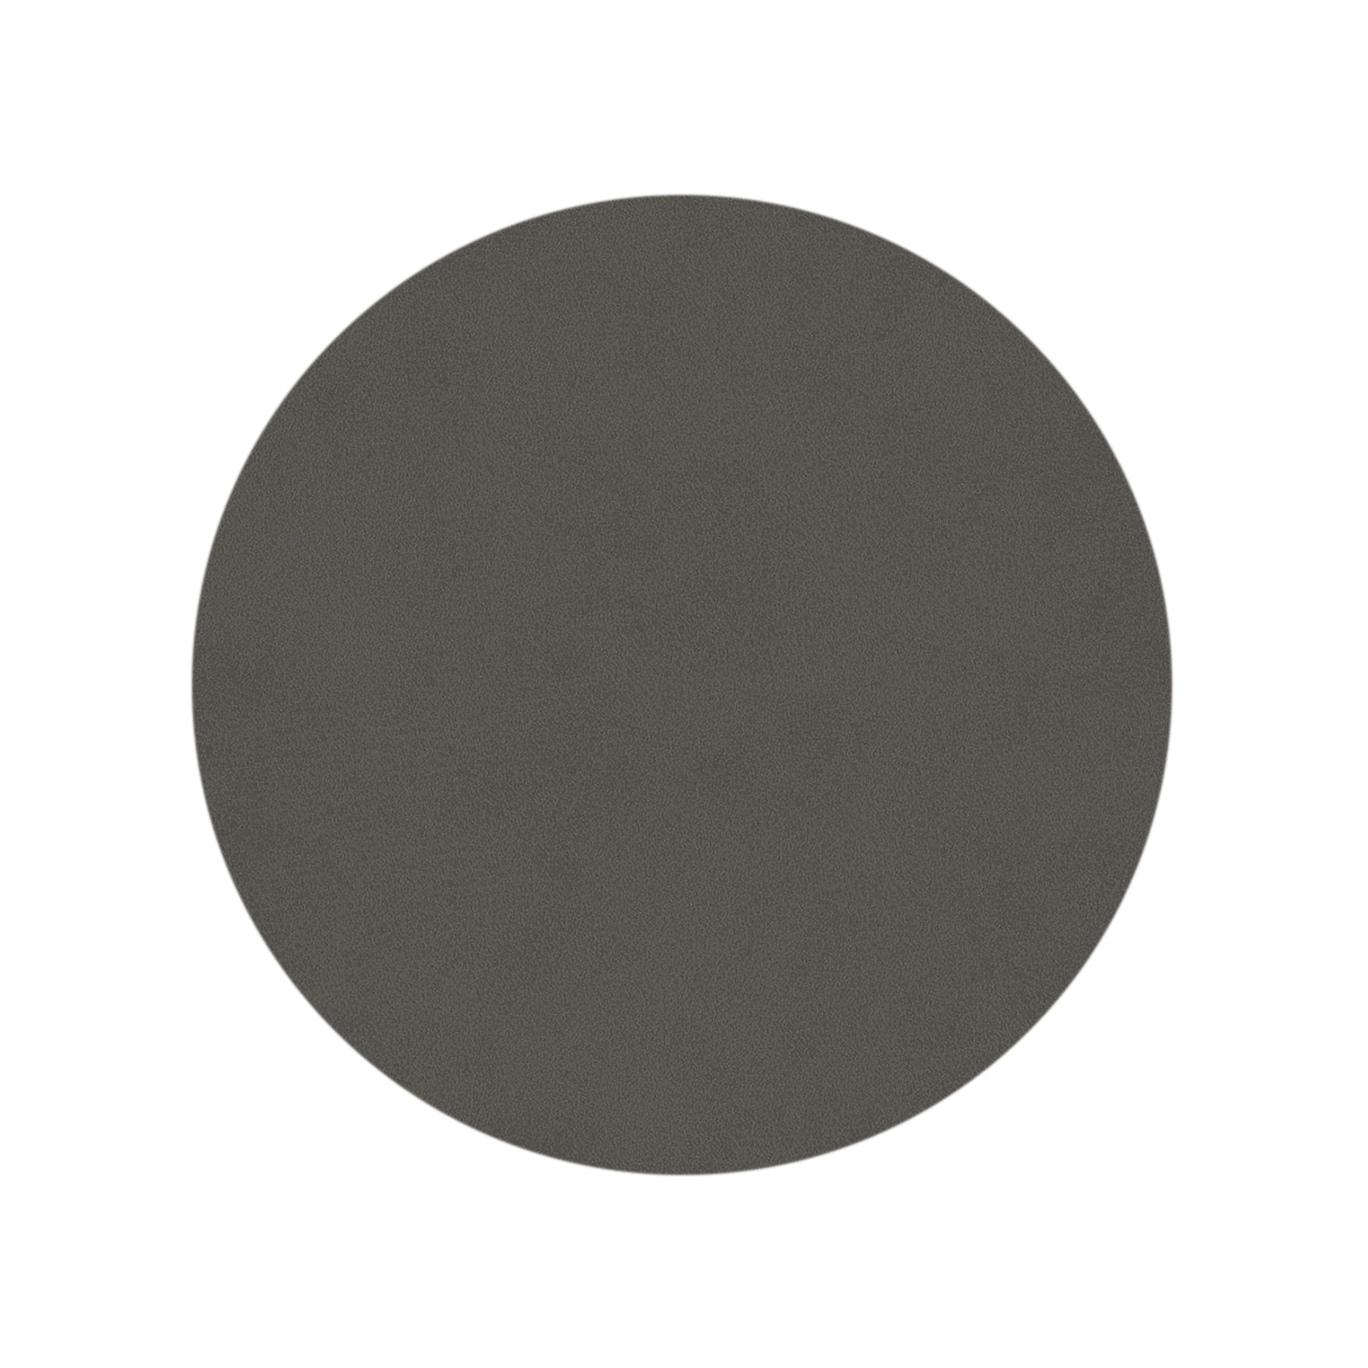 Weston Leather - Cinder